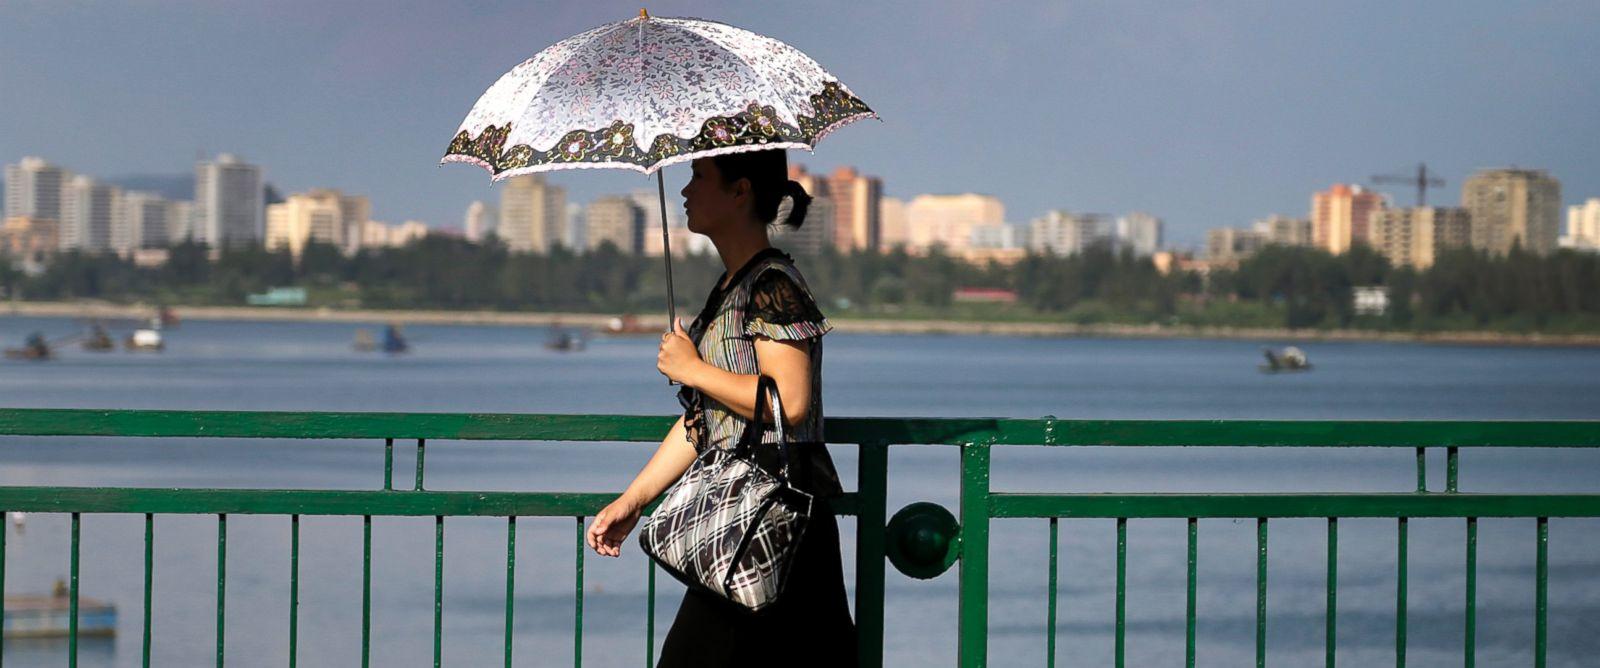 PHOTO: A North Korean woman walks along the Taedong River in Pyongyang, North Korea on Aug. 30, 2014.